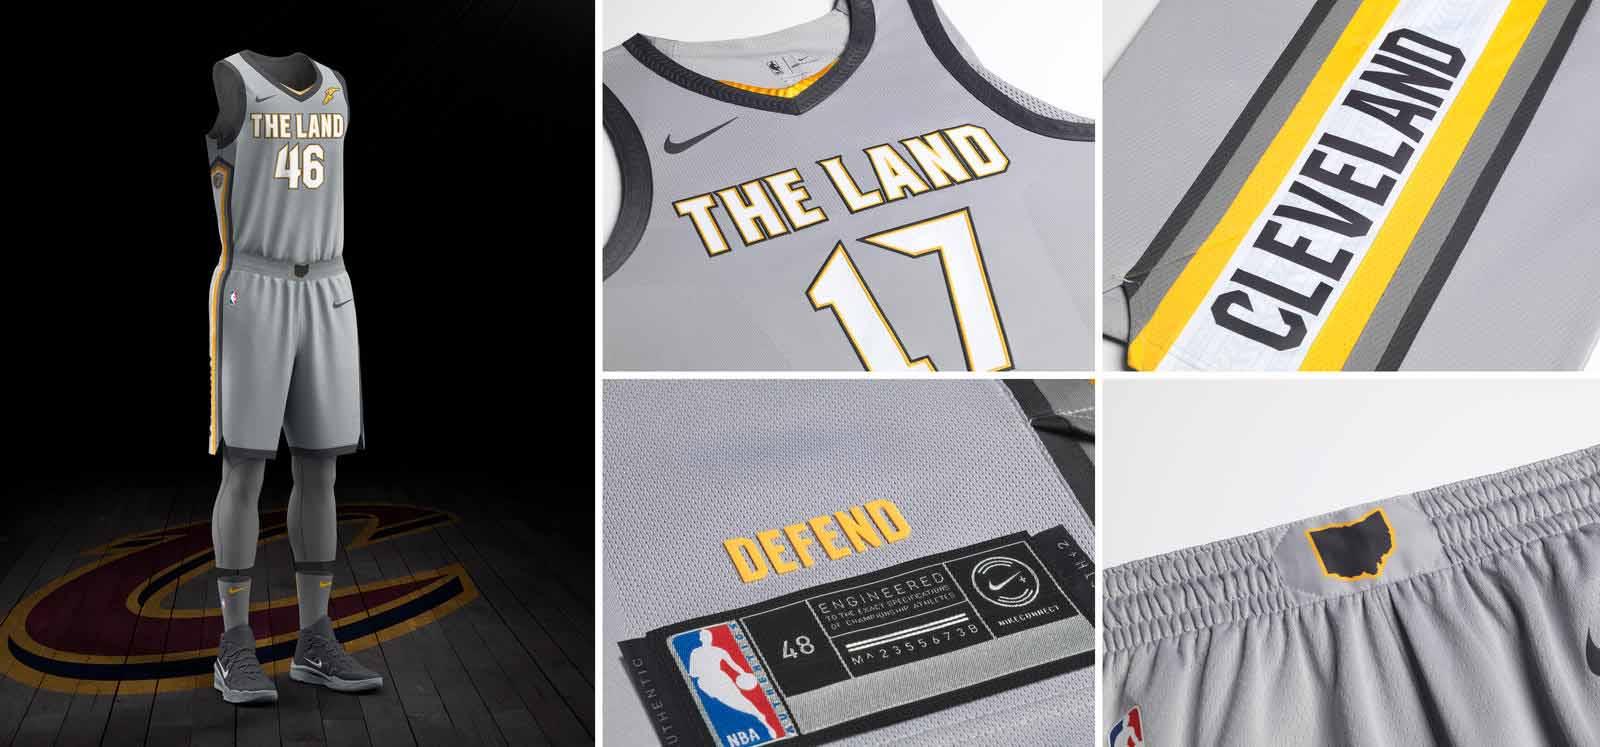 Nike_NBA_City_Edition_Uniform_Cleveland_Cavaliers_Group_native_1600